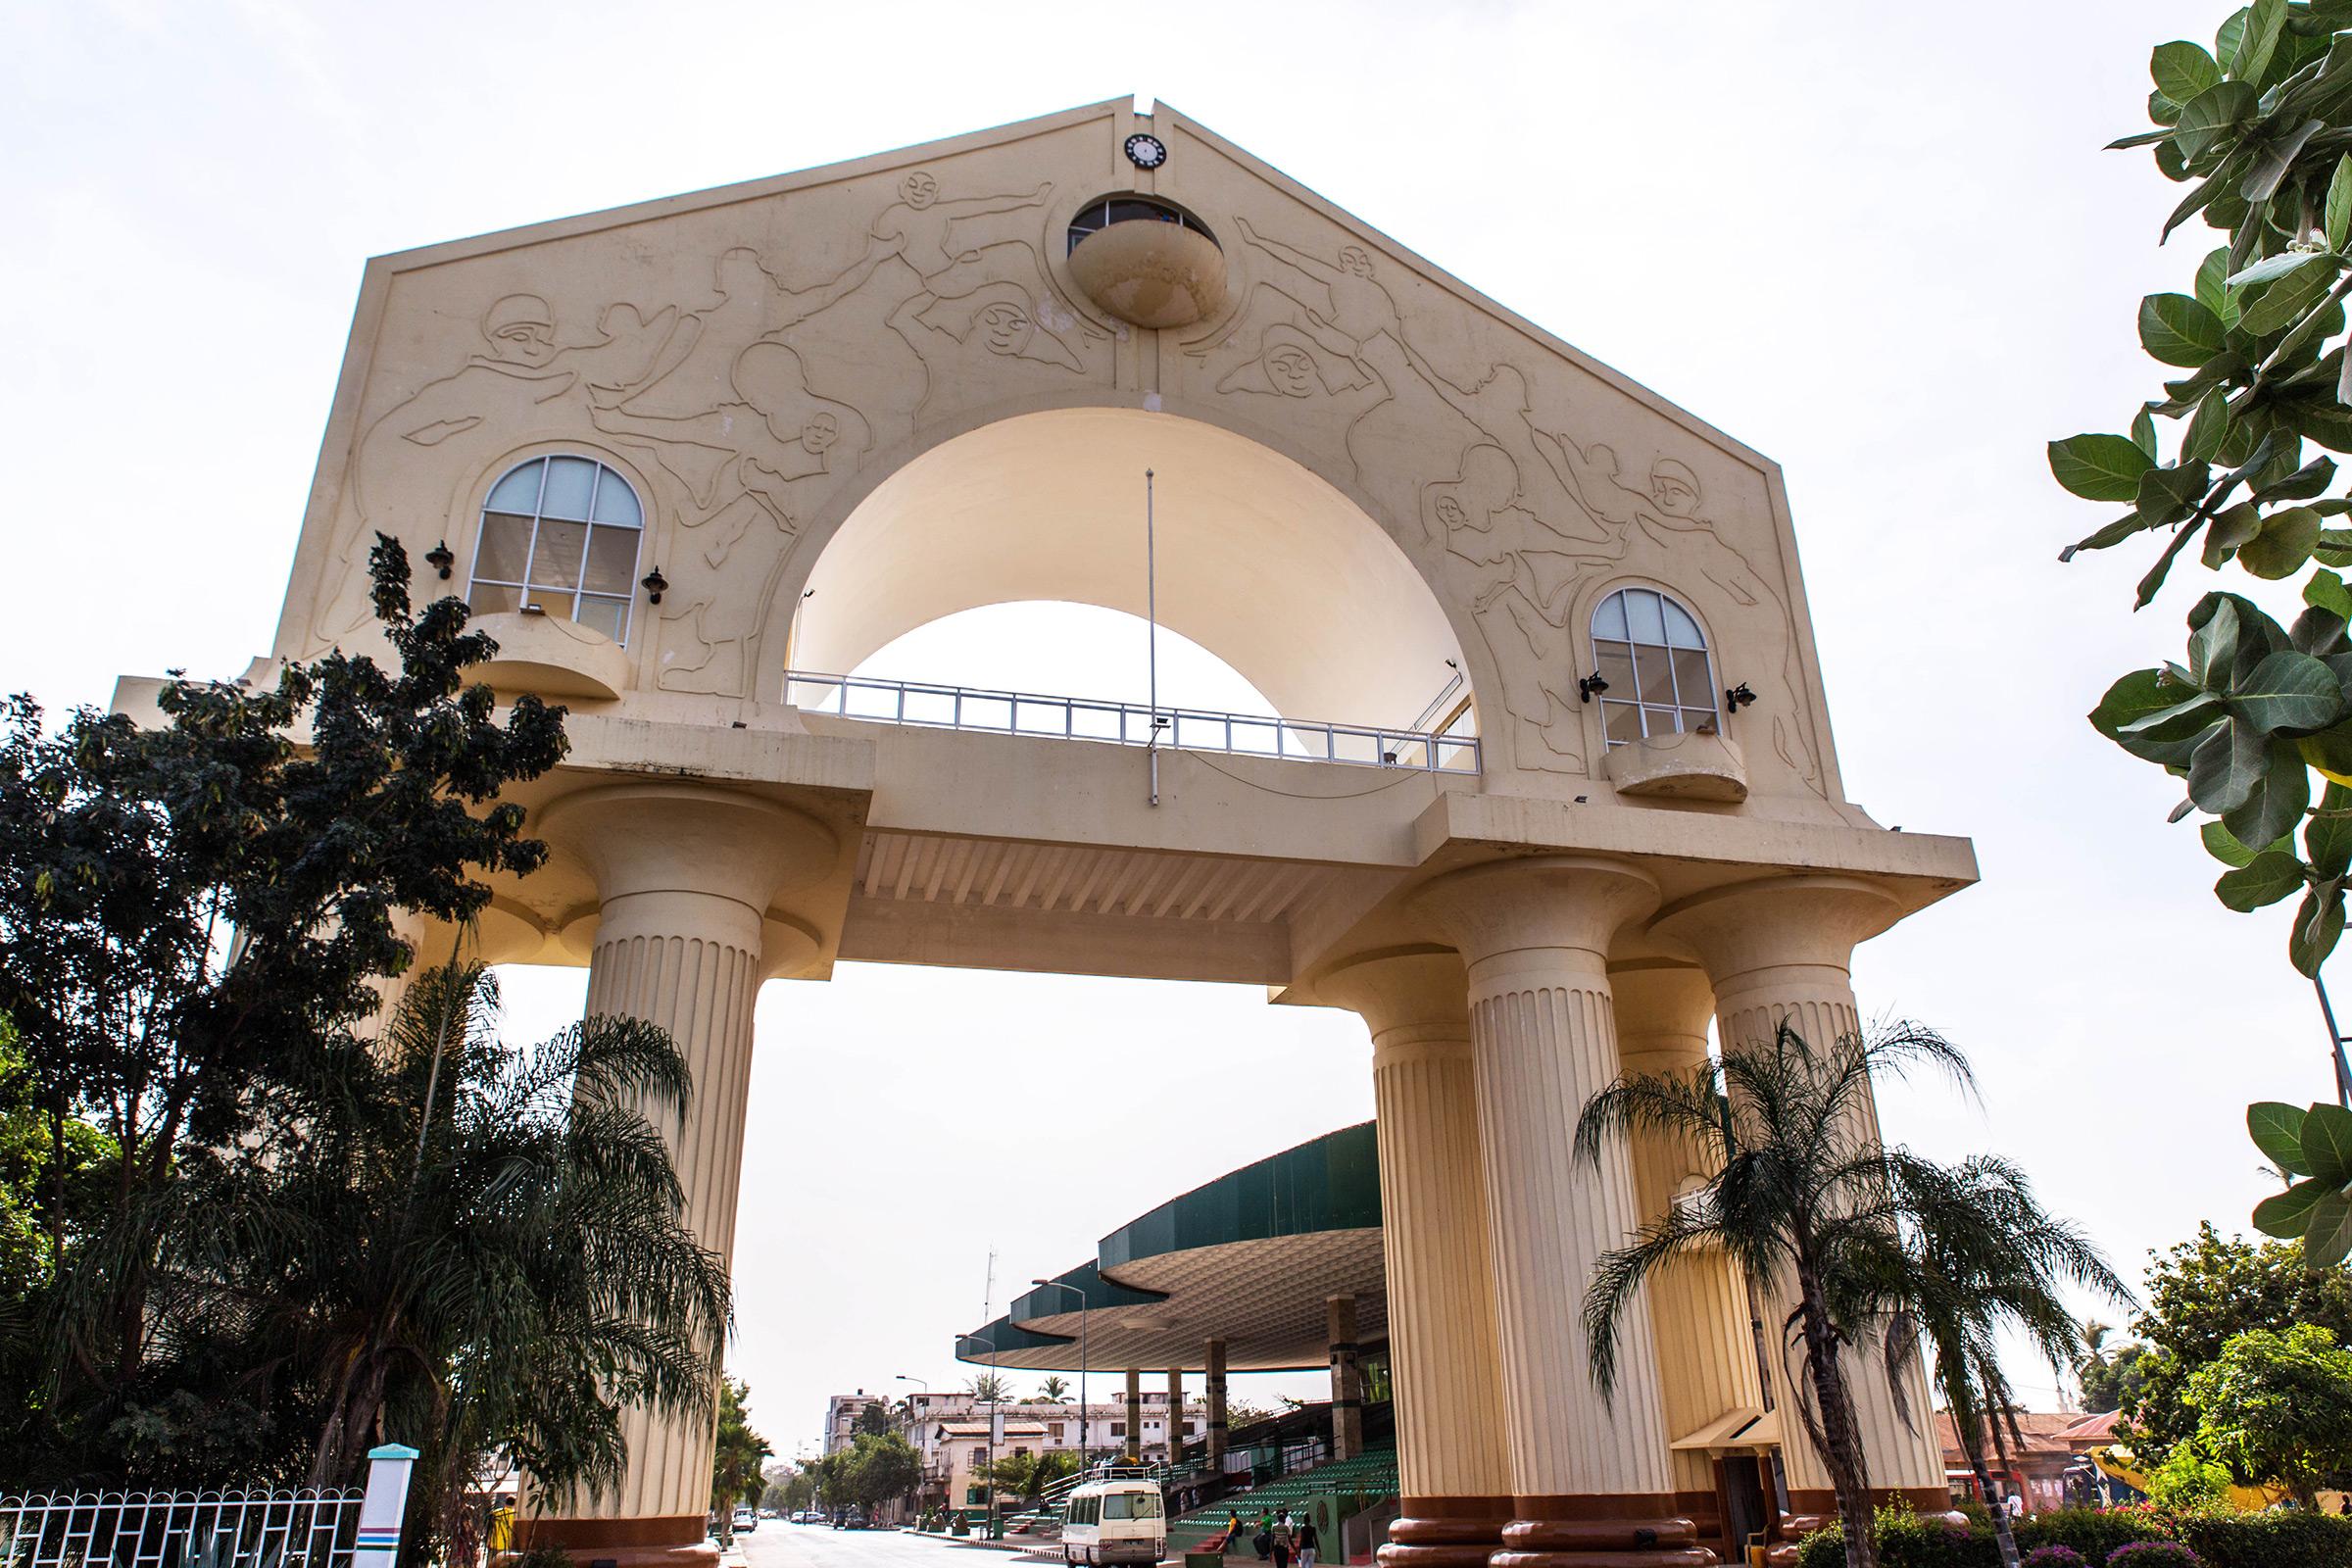 Gambia Banjul Arch 22